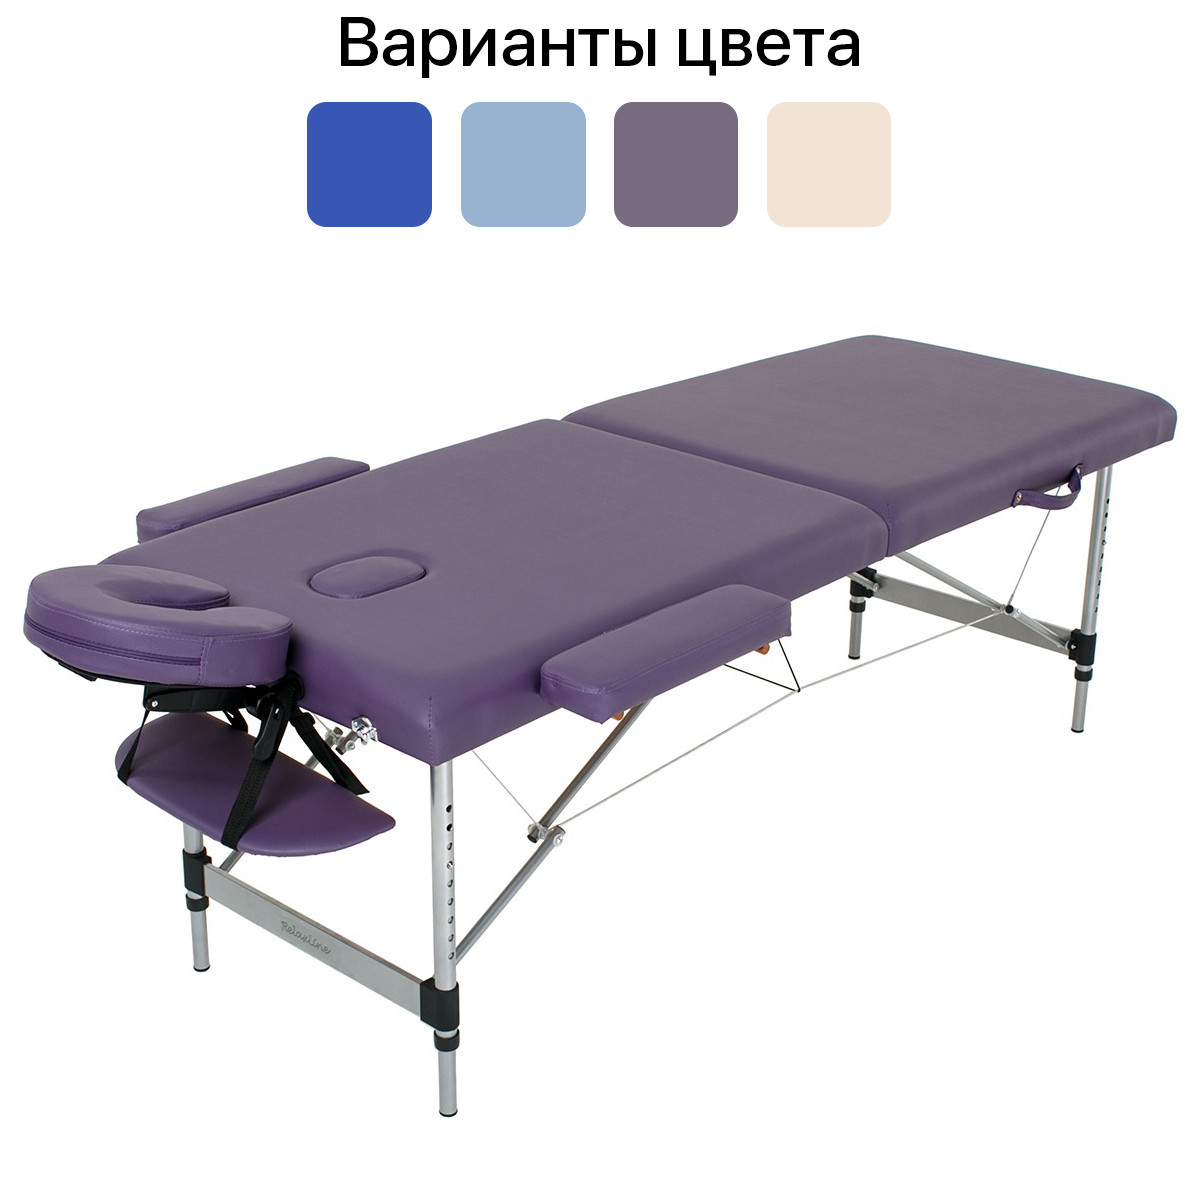 Массажный стол алюминиевый 2-х сегментный RelaxLine Florence кушетка массажная для массажа